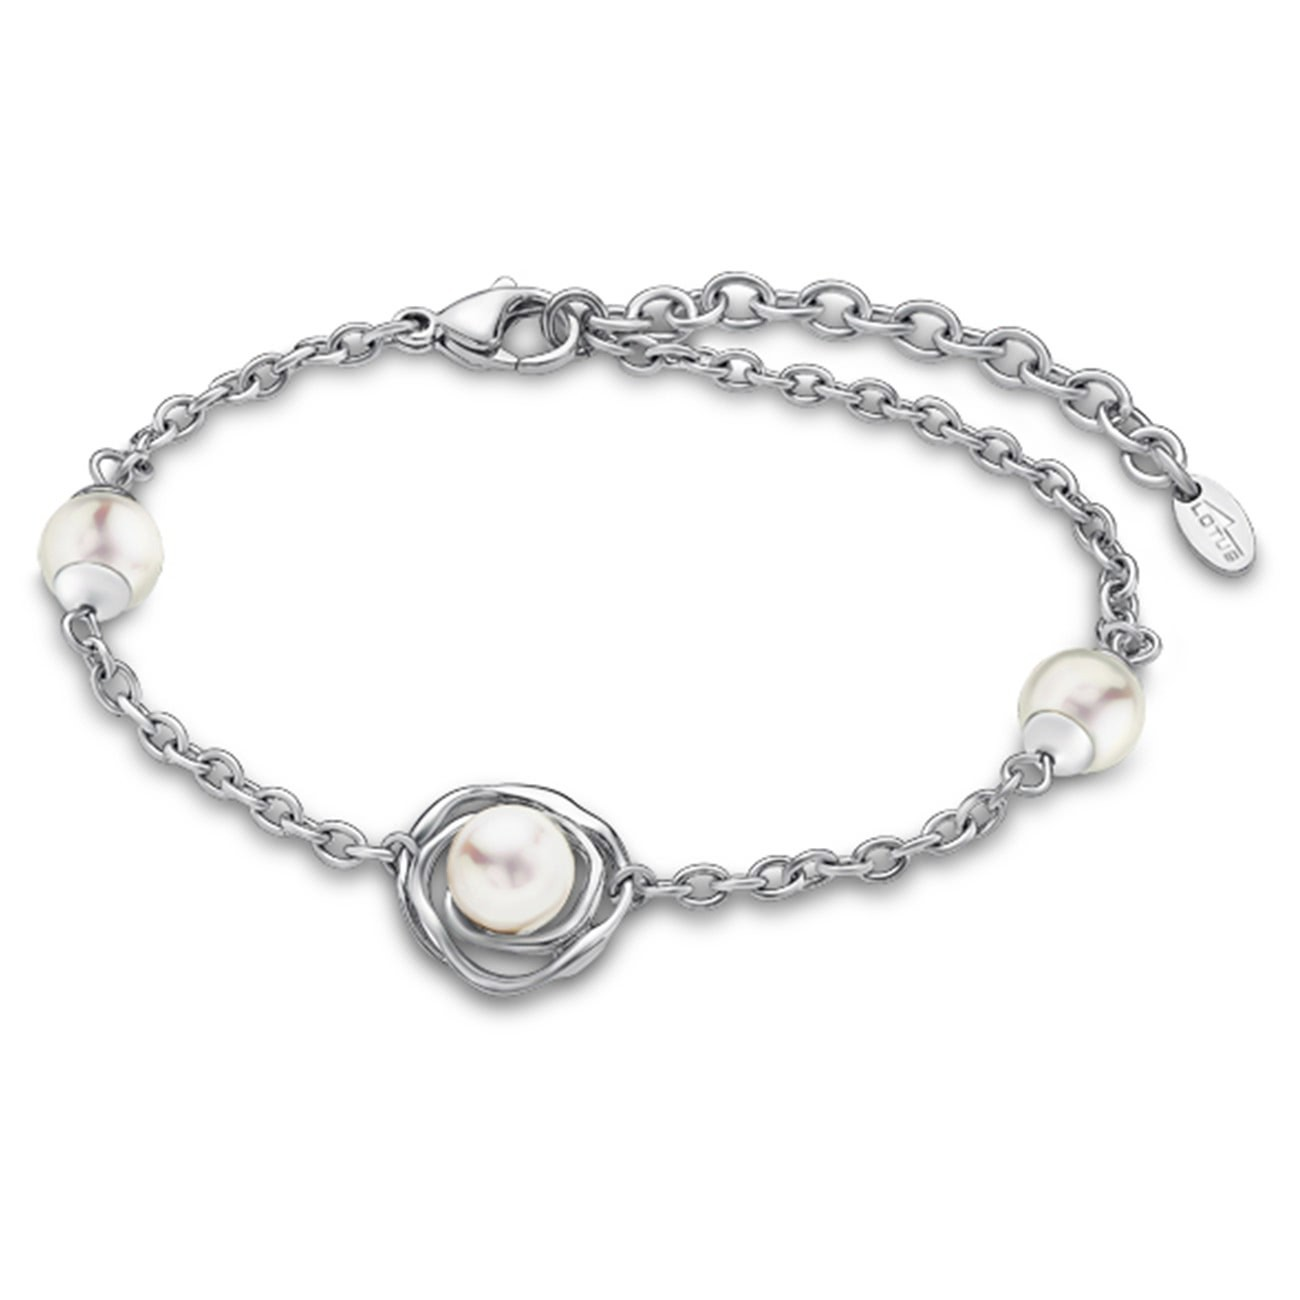 Lotus Style Armband Damen Perle silber LS1855-2/1 Privilege JLS1855-2-1